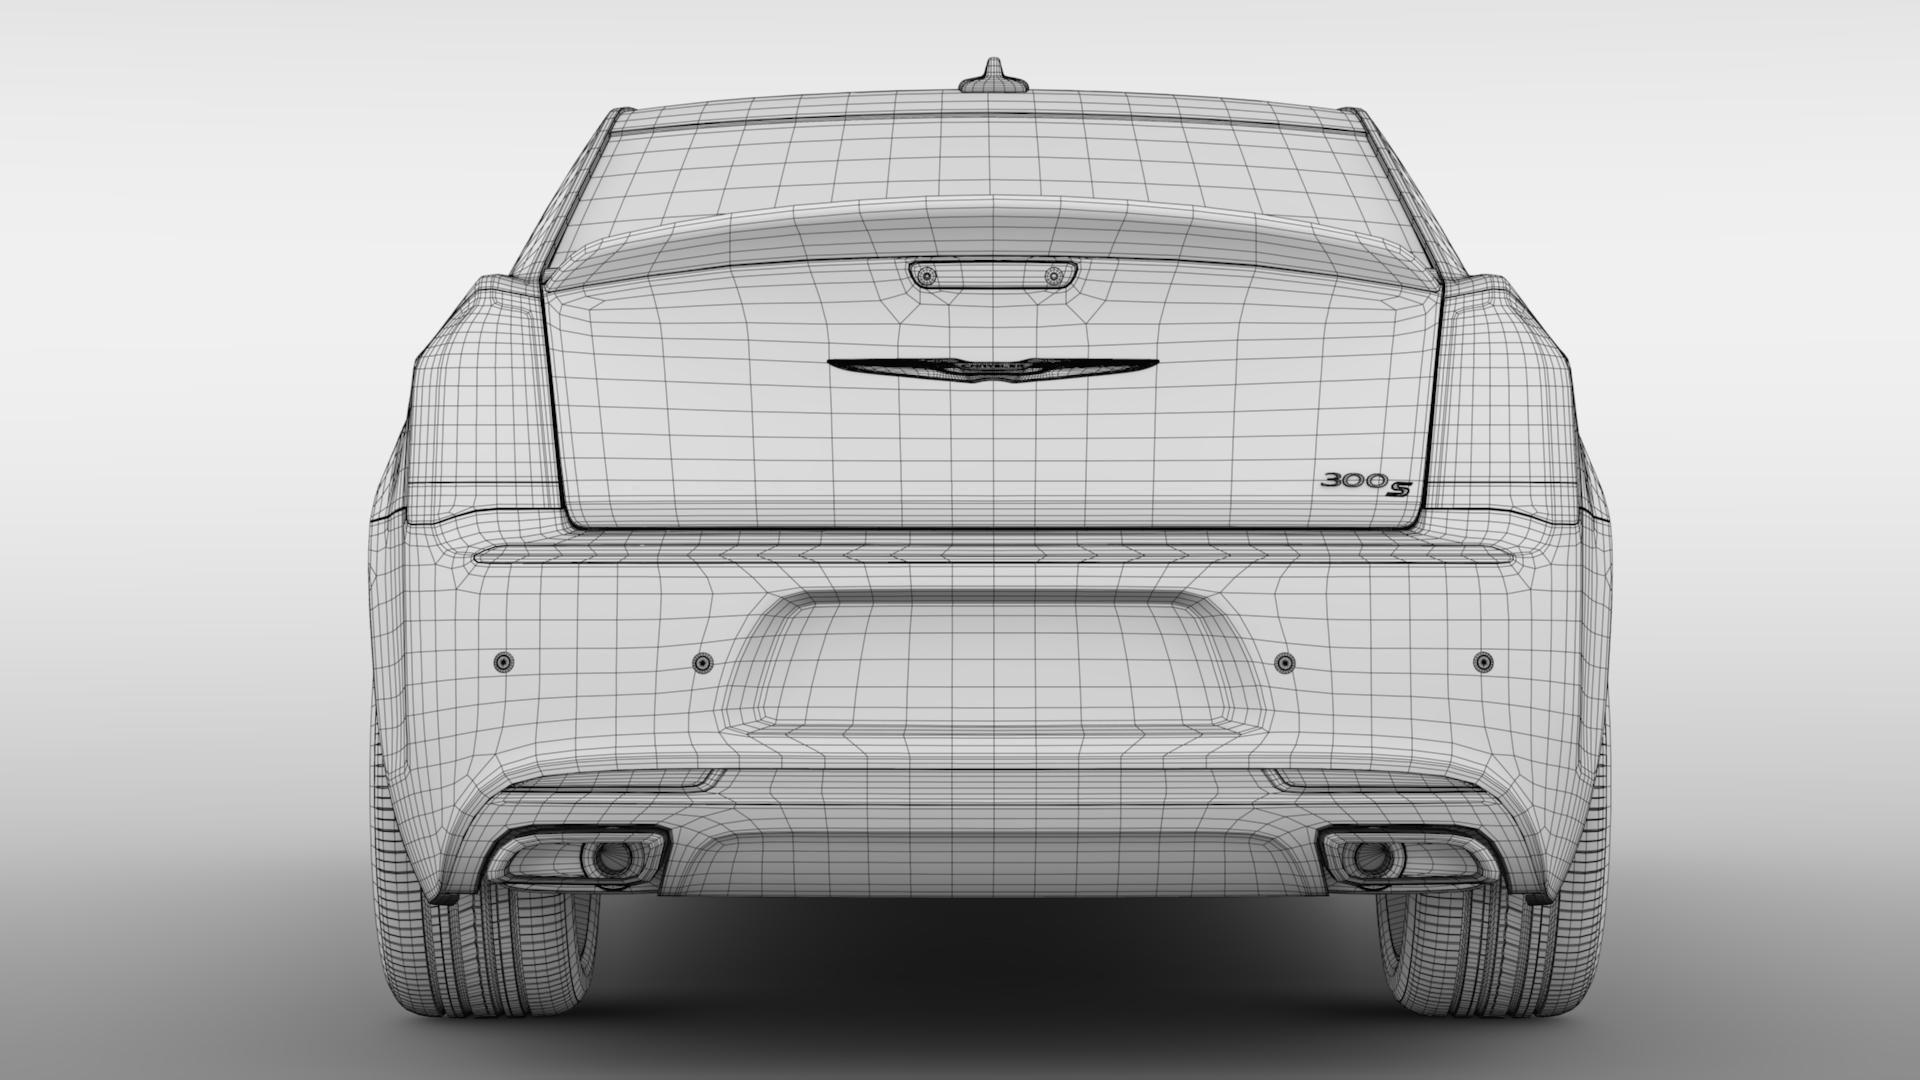 chrysler 300 s sport lx2 2018 3d model 3ds max fbx c4d lwo ma mb hrc xsi obj 284583